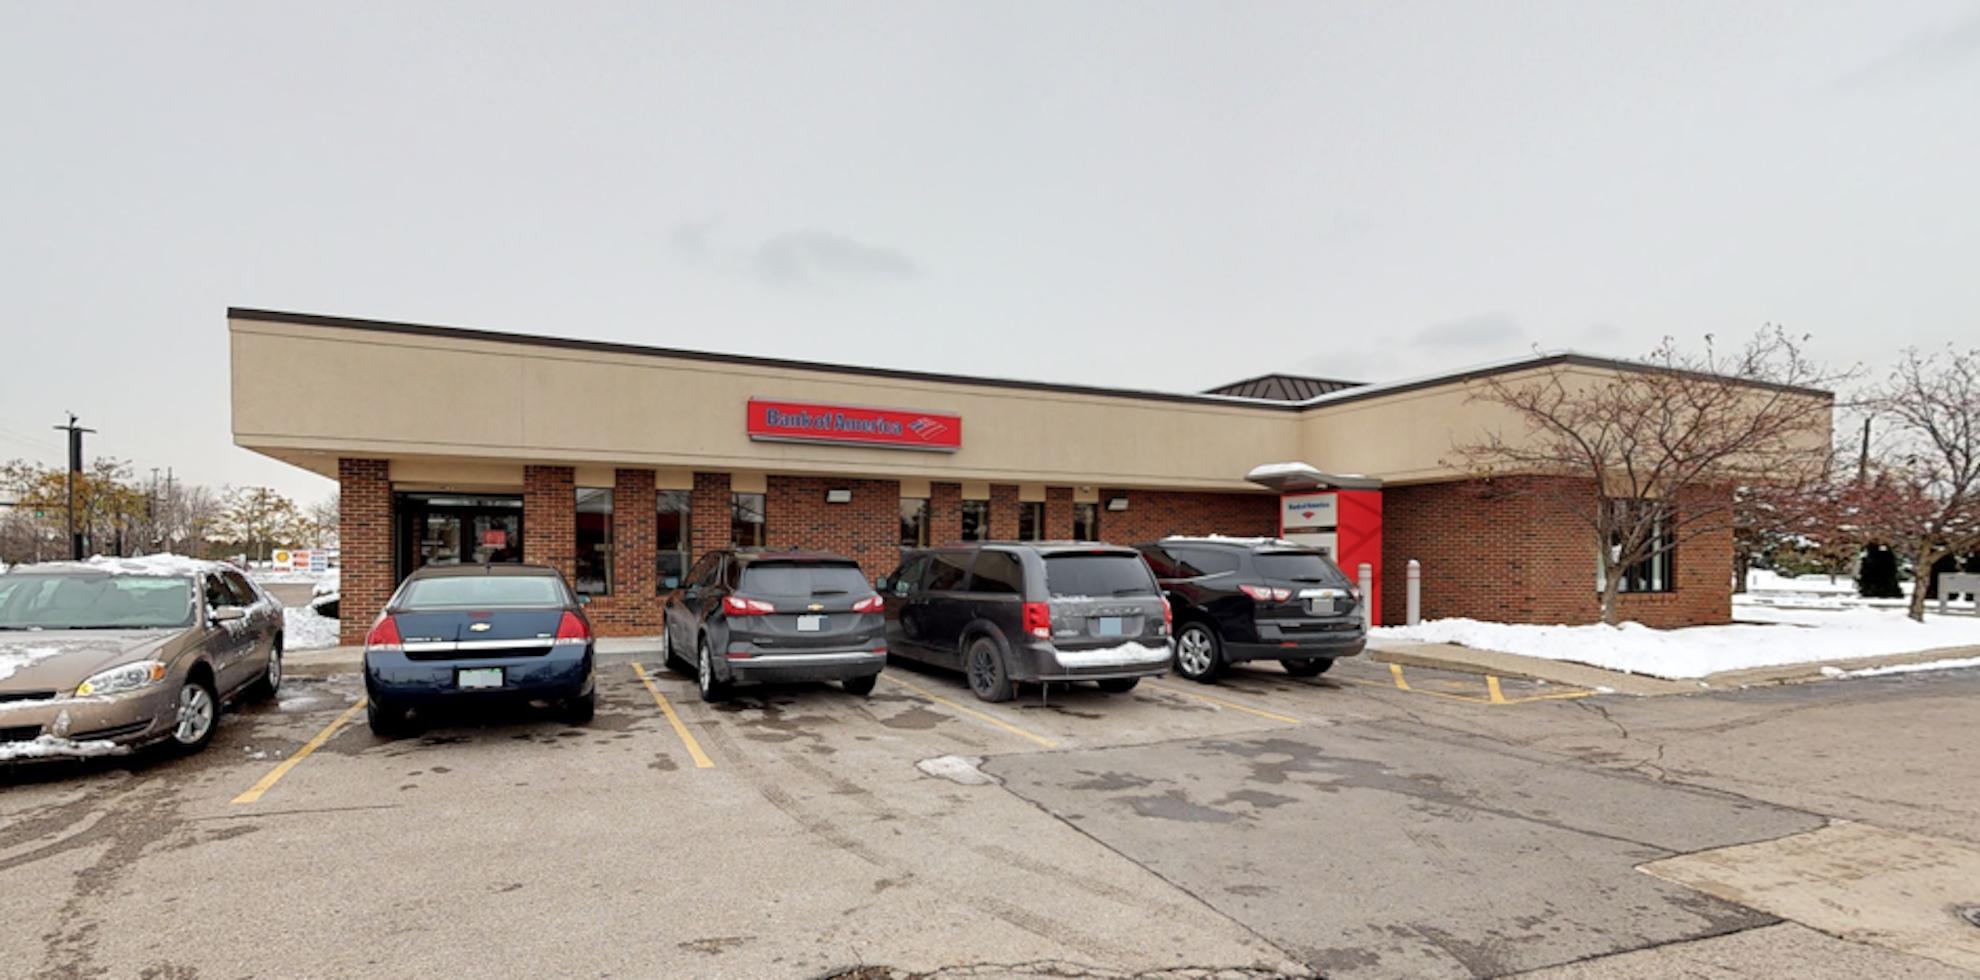 Bank of America financial center with drive-thru ATM | 40950 Garfield Rd, Clinton Township, MI 48038